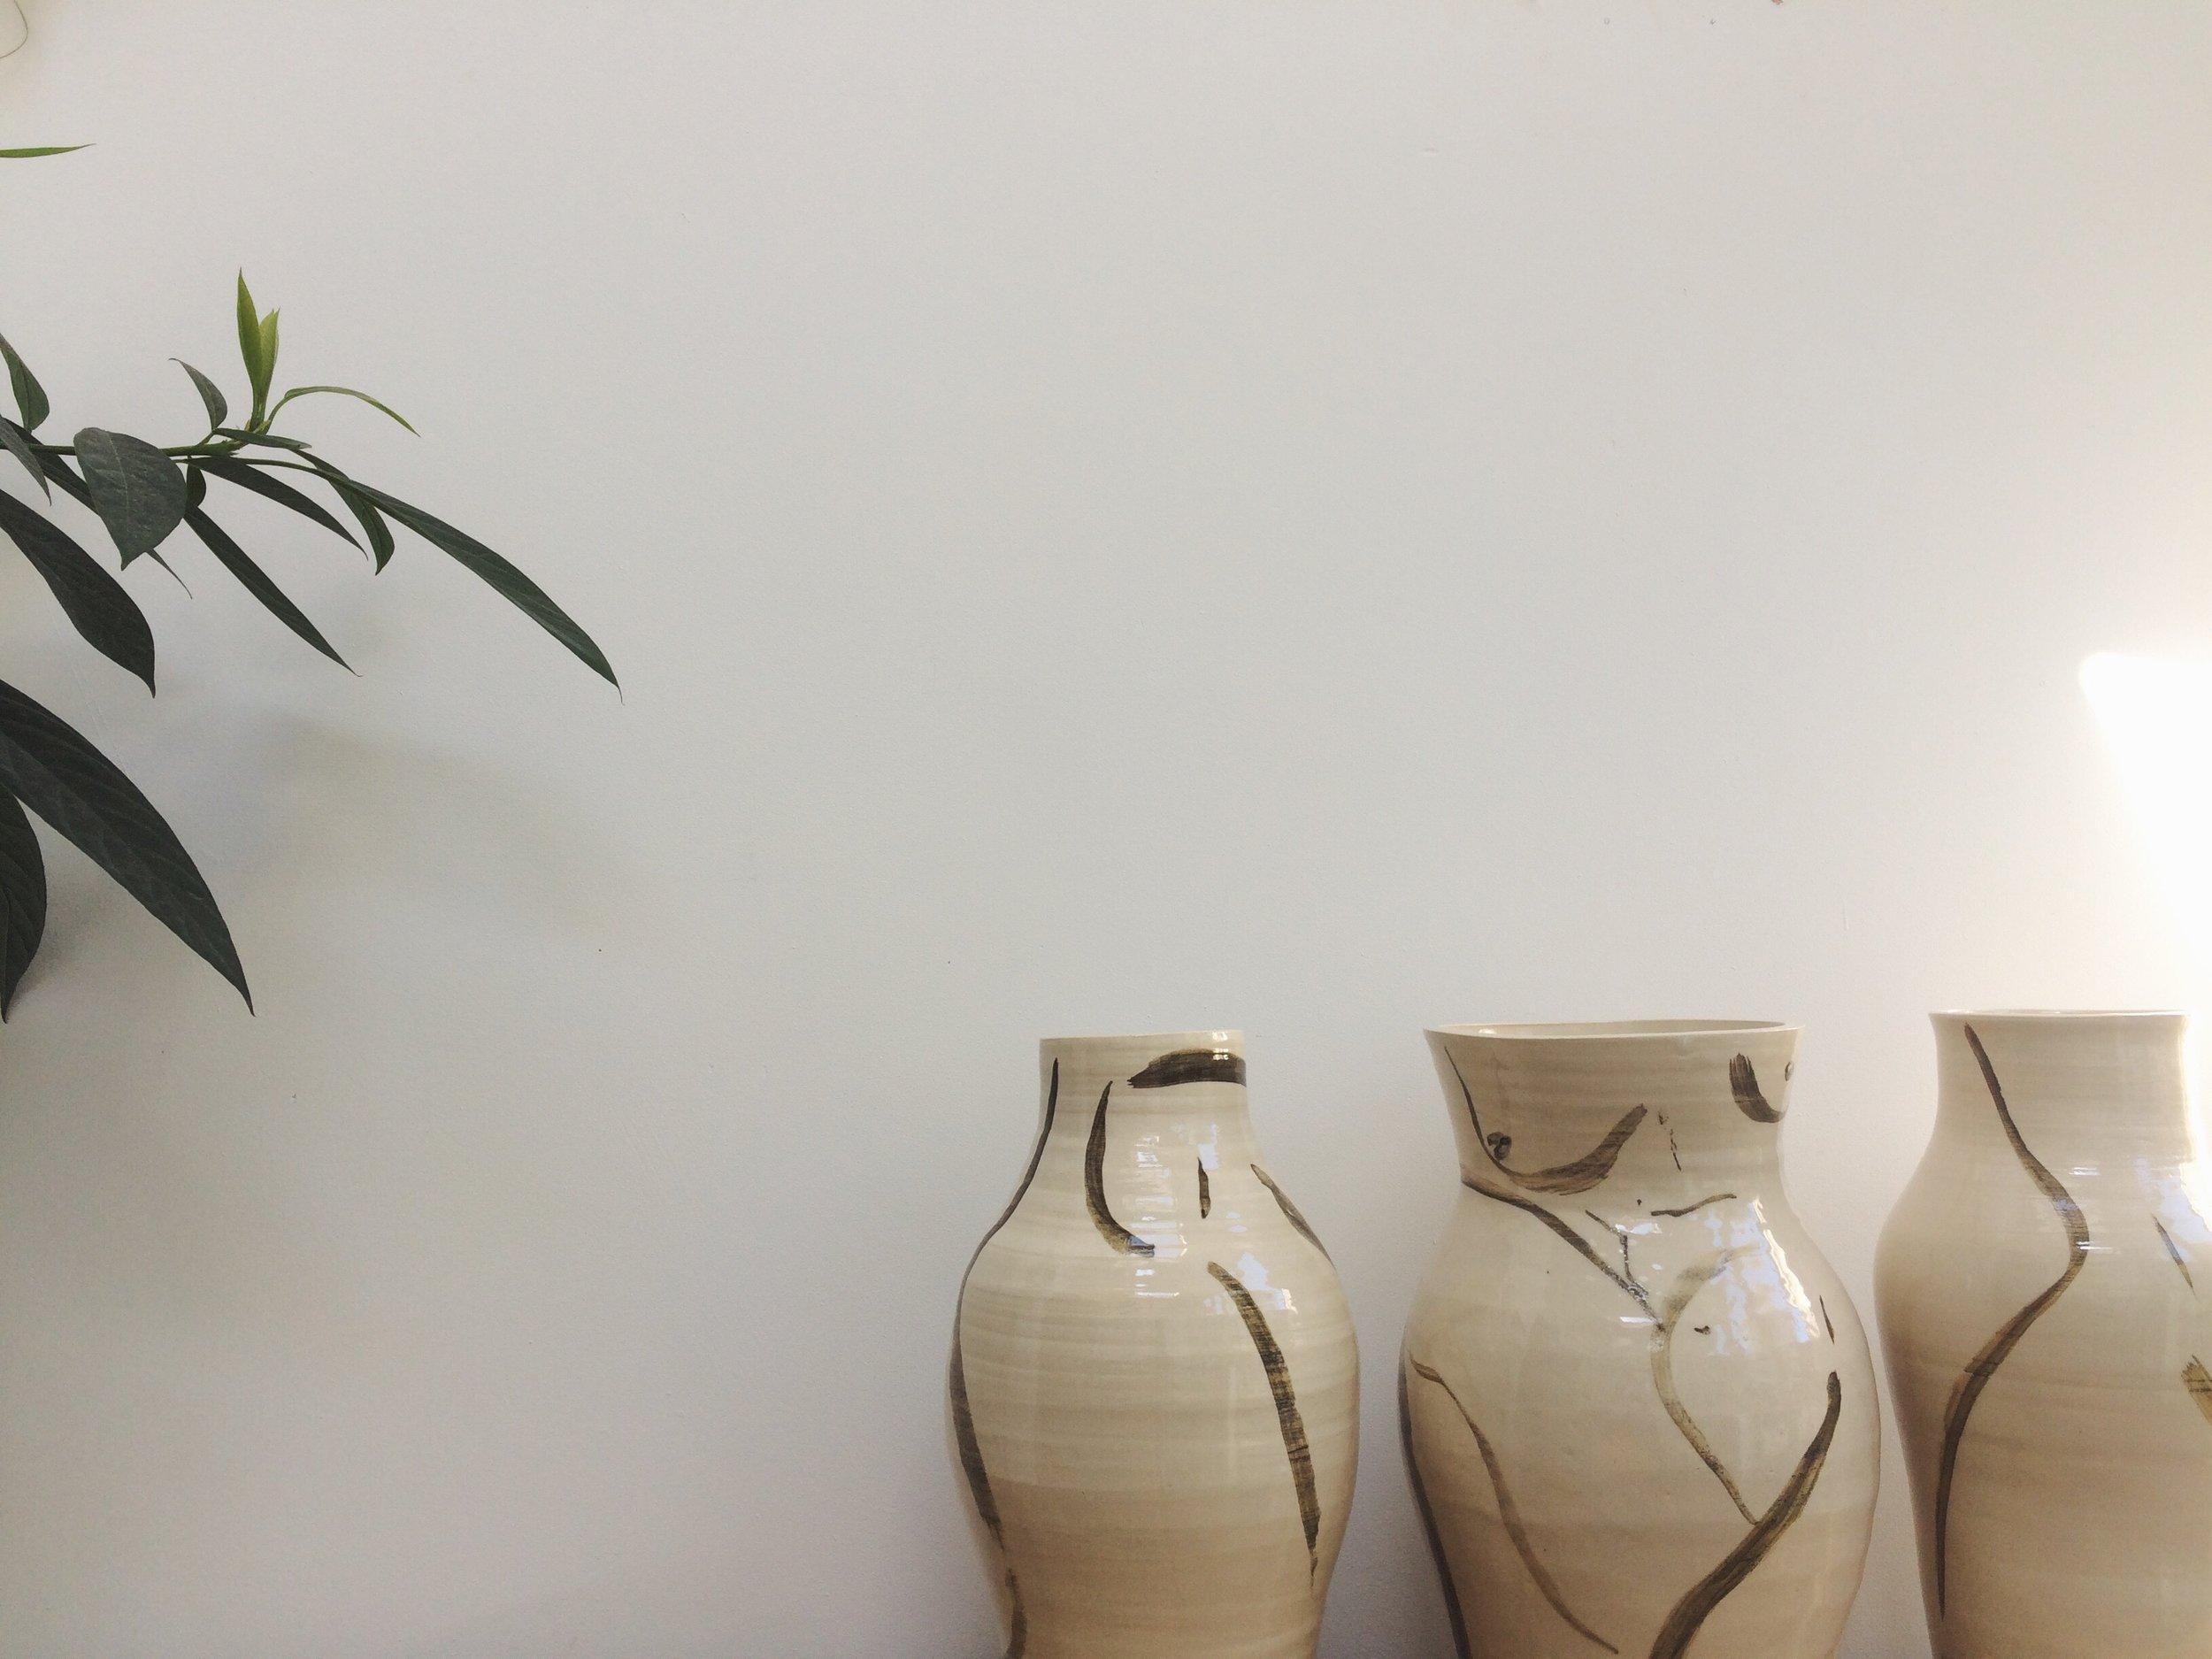 large vases